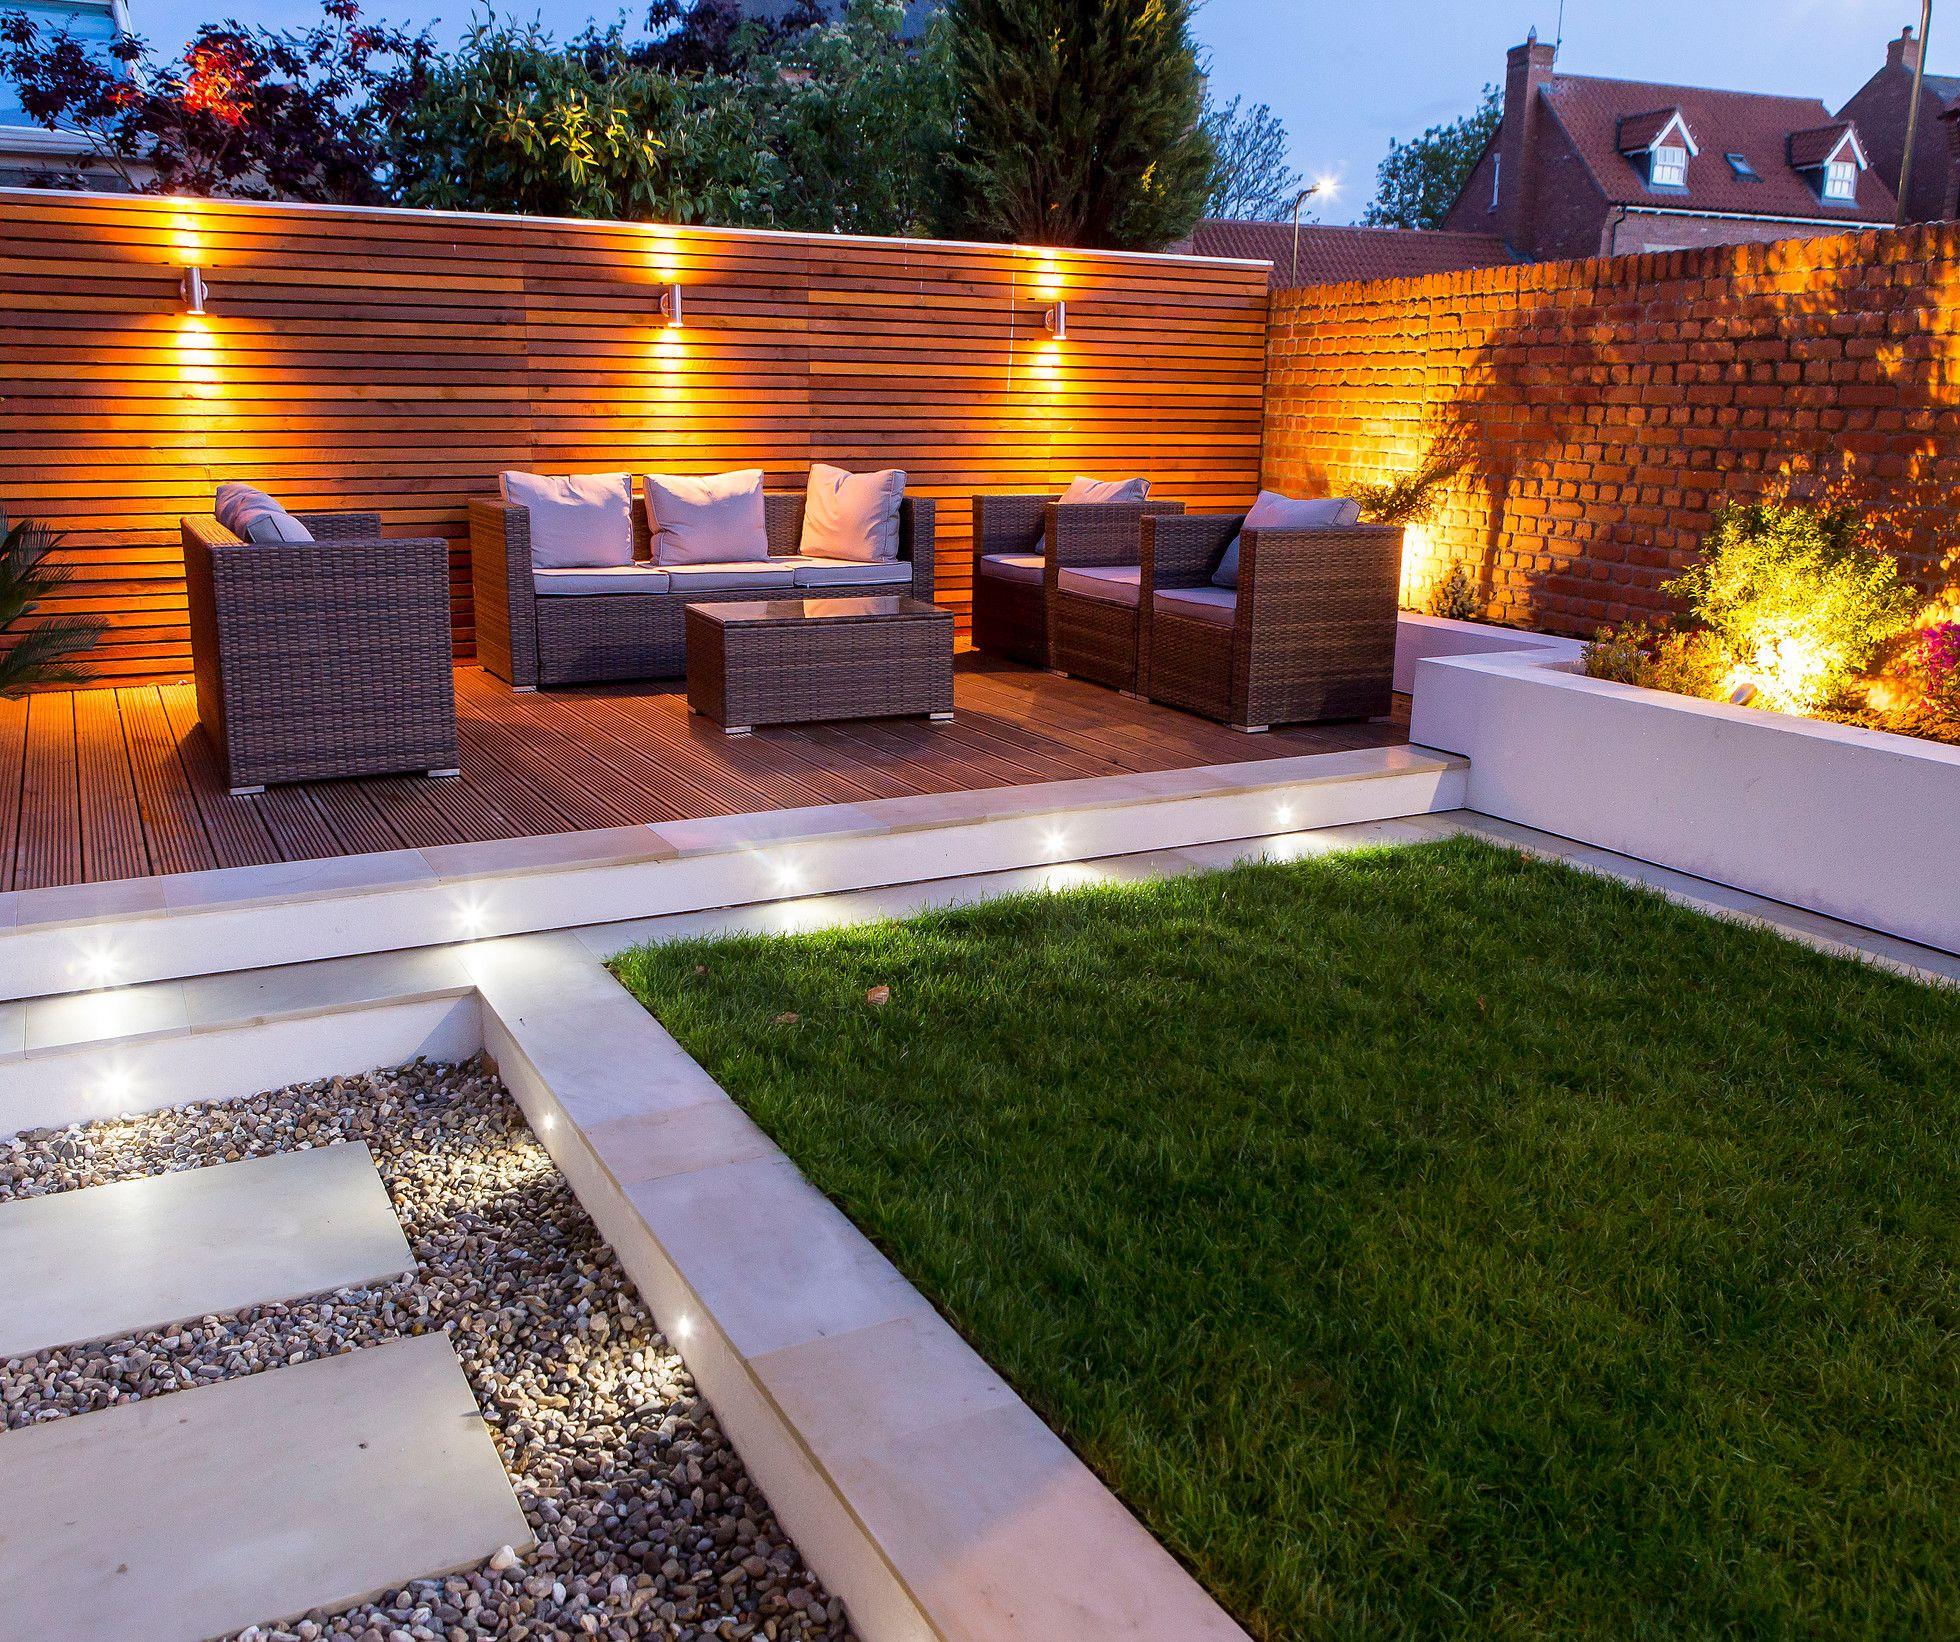 archiscape  GALLERY Contemporary garden design in York, England